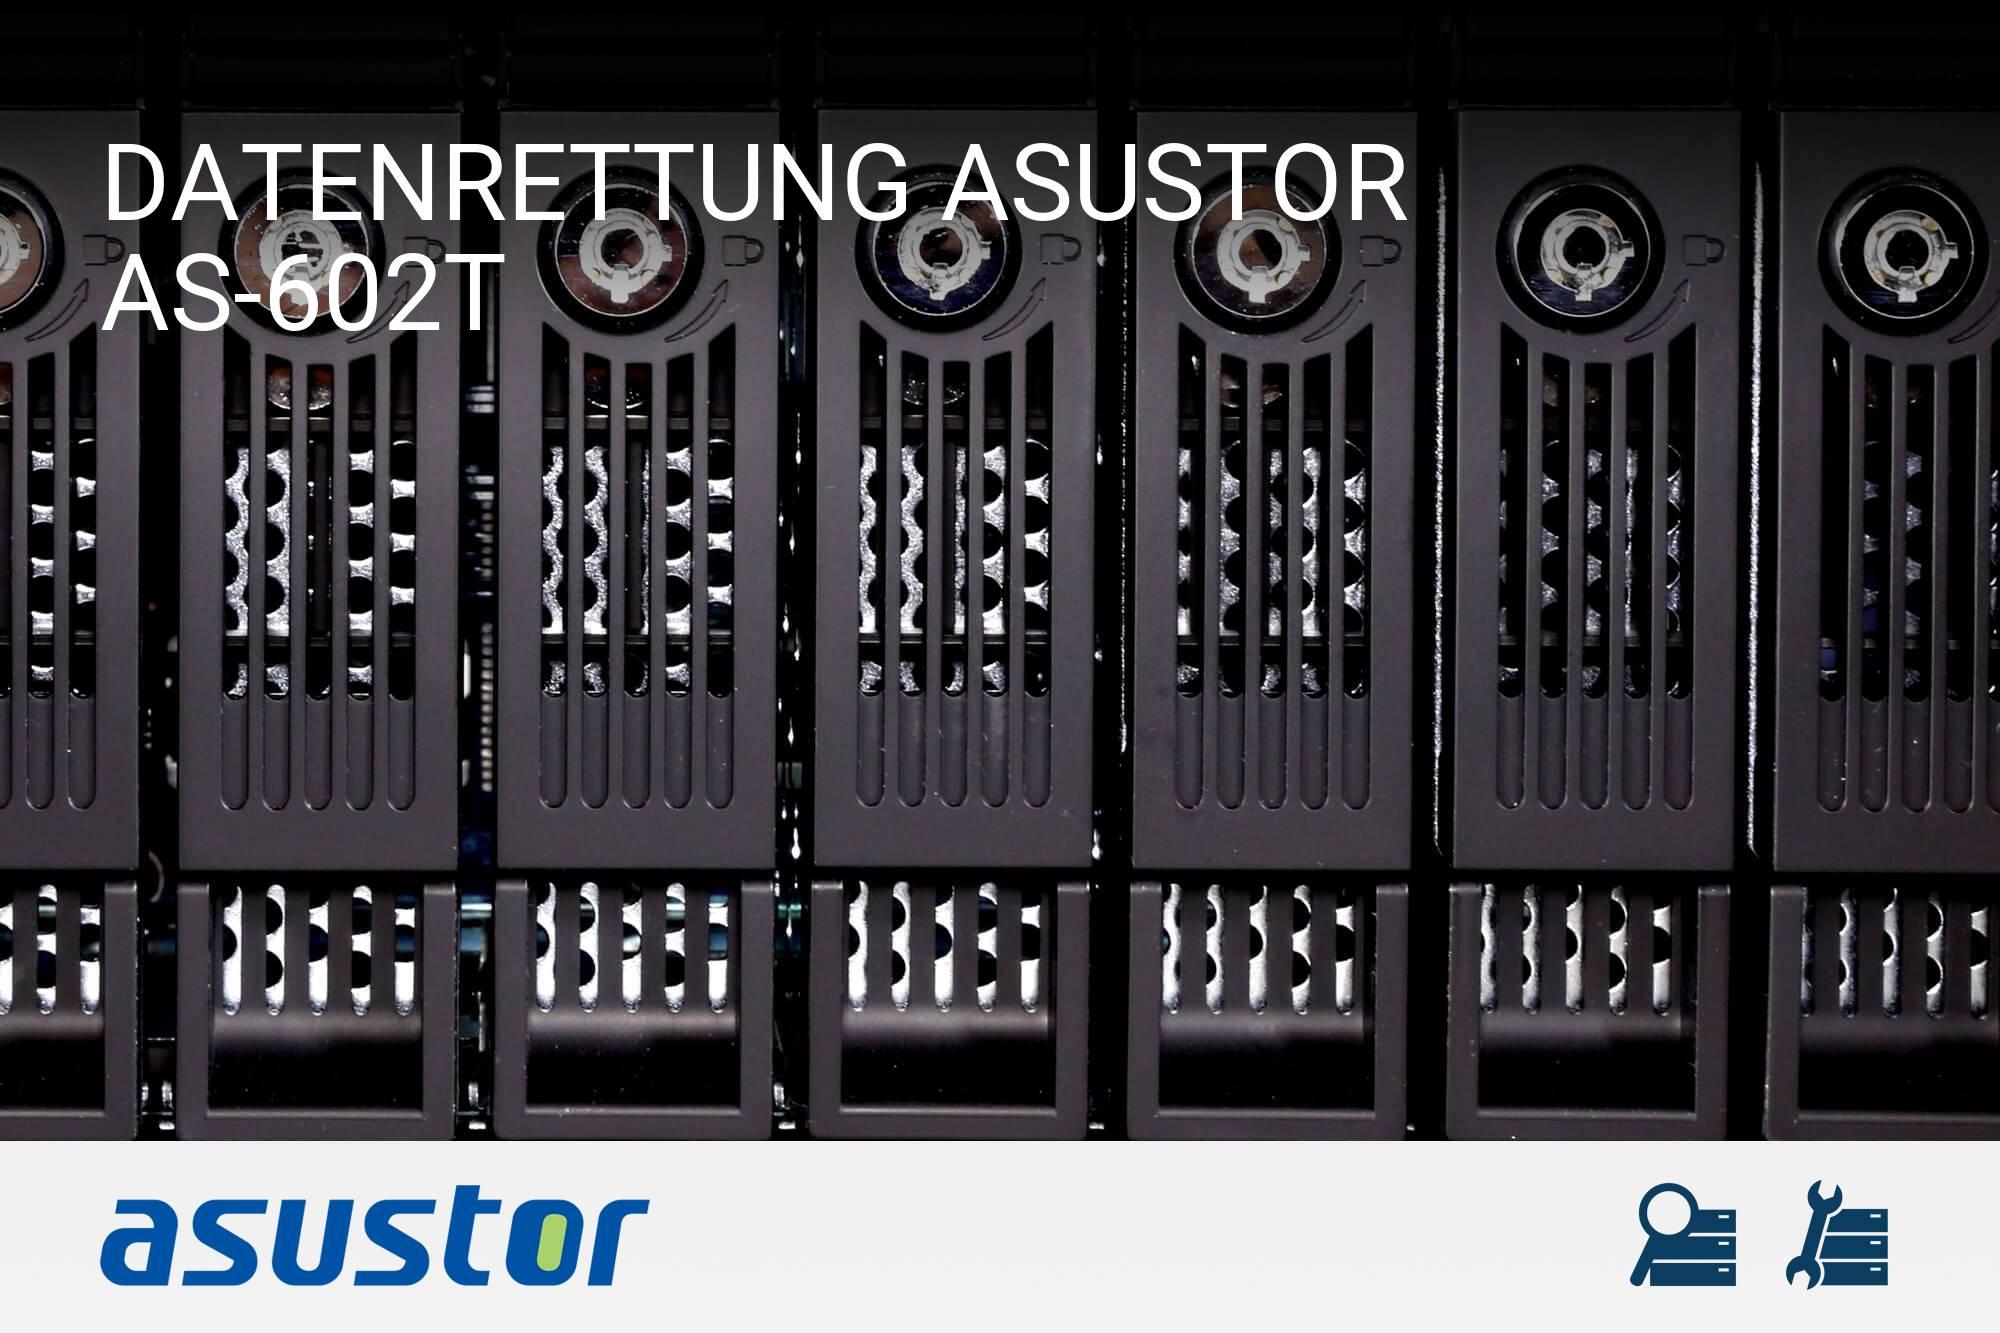 Asustor AS-602T